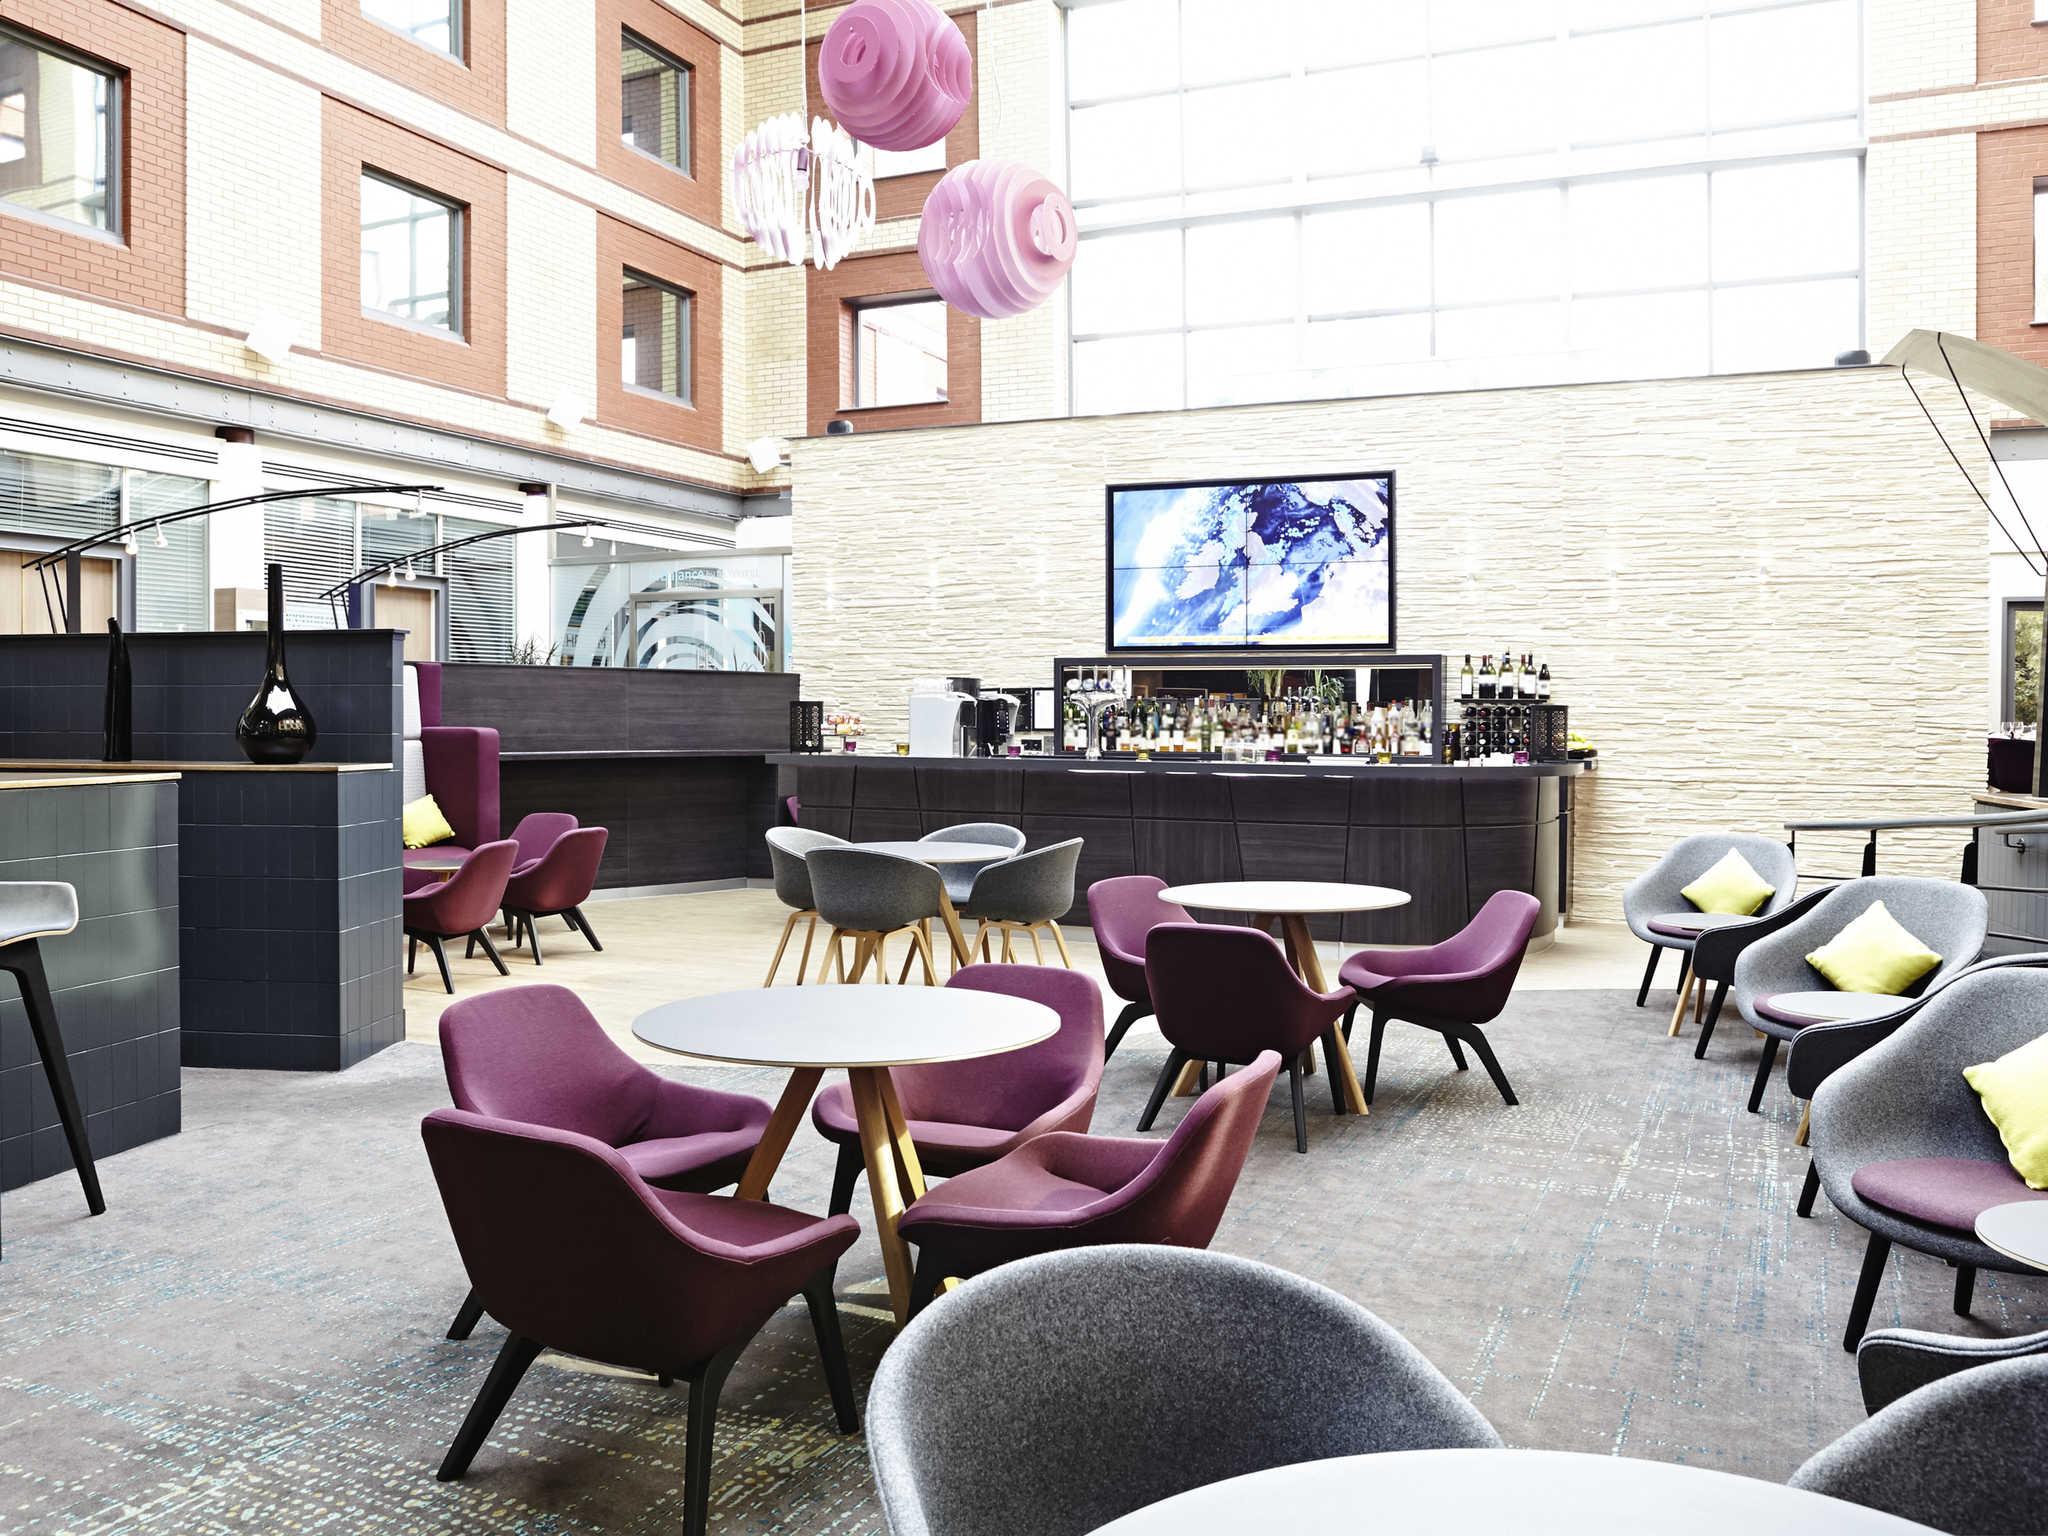 Hotel - Novotel London Heathrow Airport - M4 Abfahrt 4